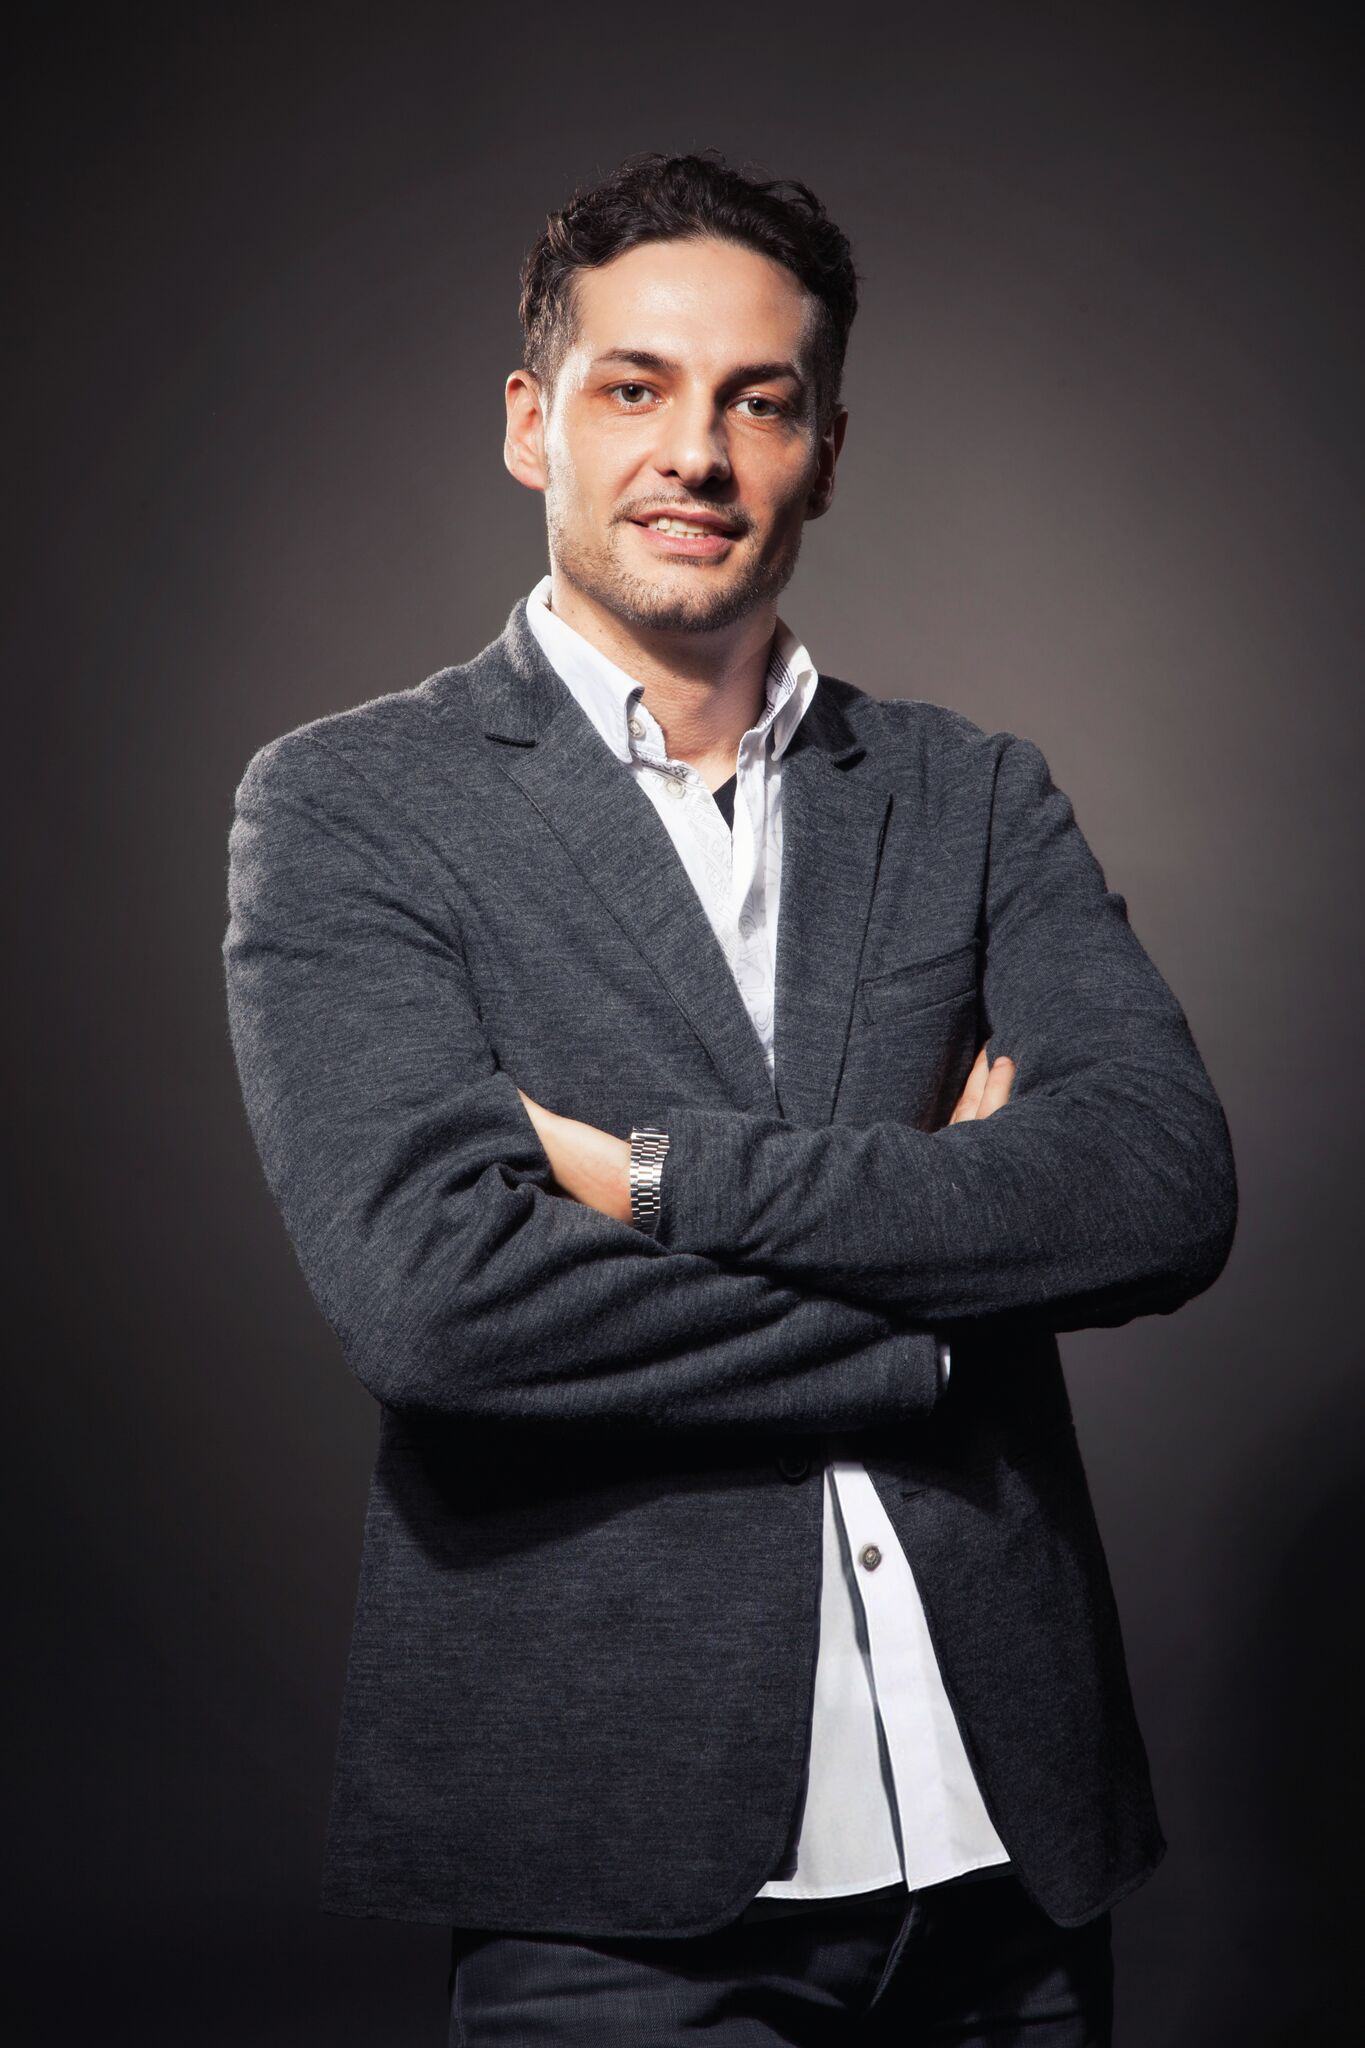 Christoph Kiehl